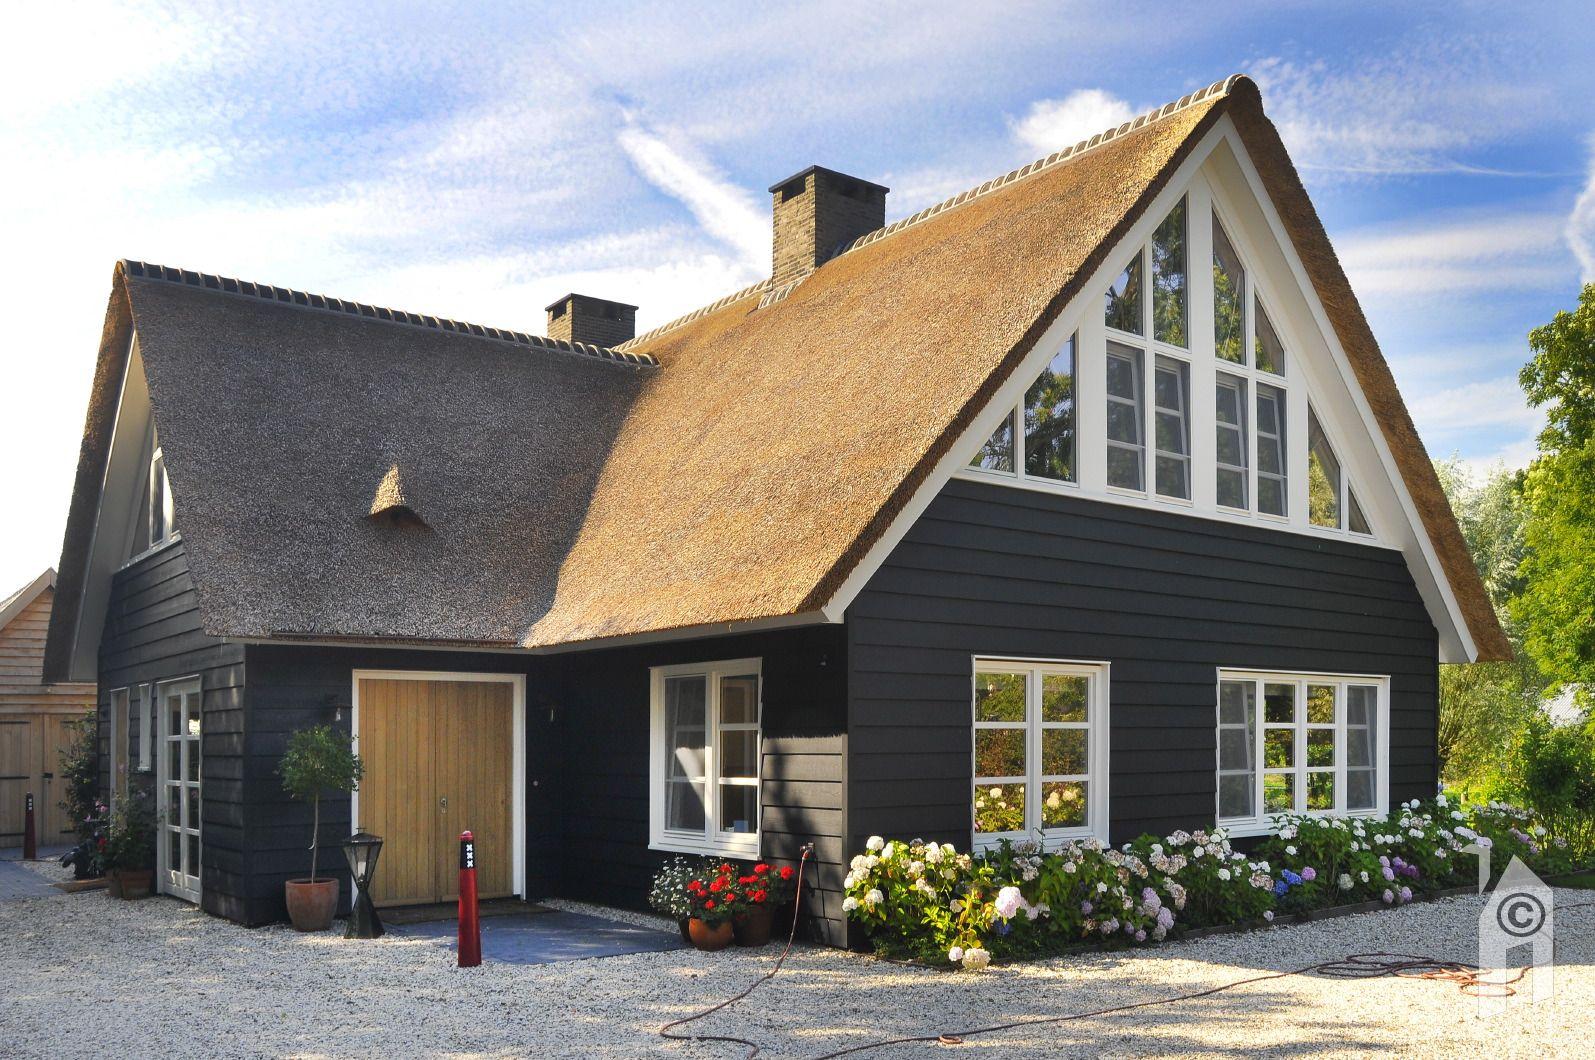 Presolid Home , \'Warm\' in alles - Eigenhuisbouwen.nl | belgian house ...